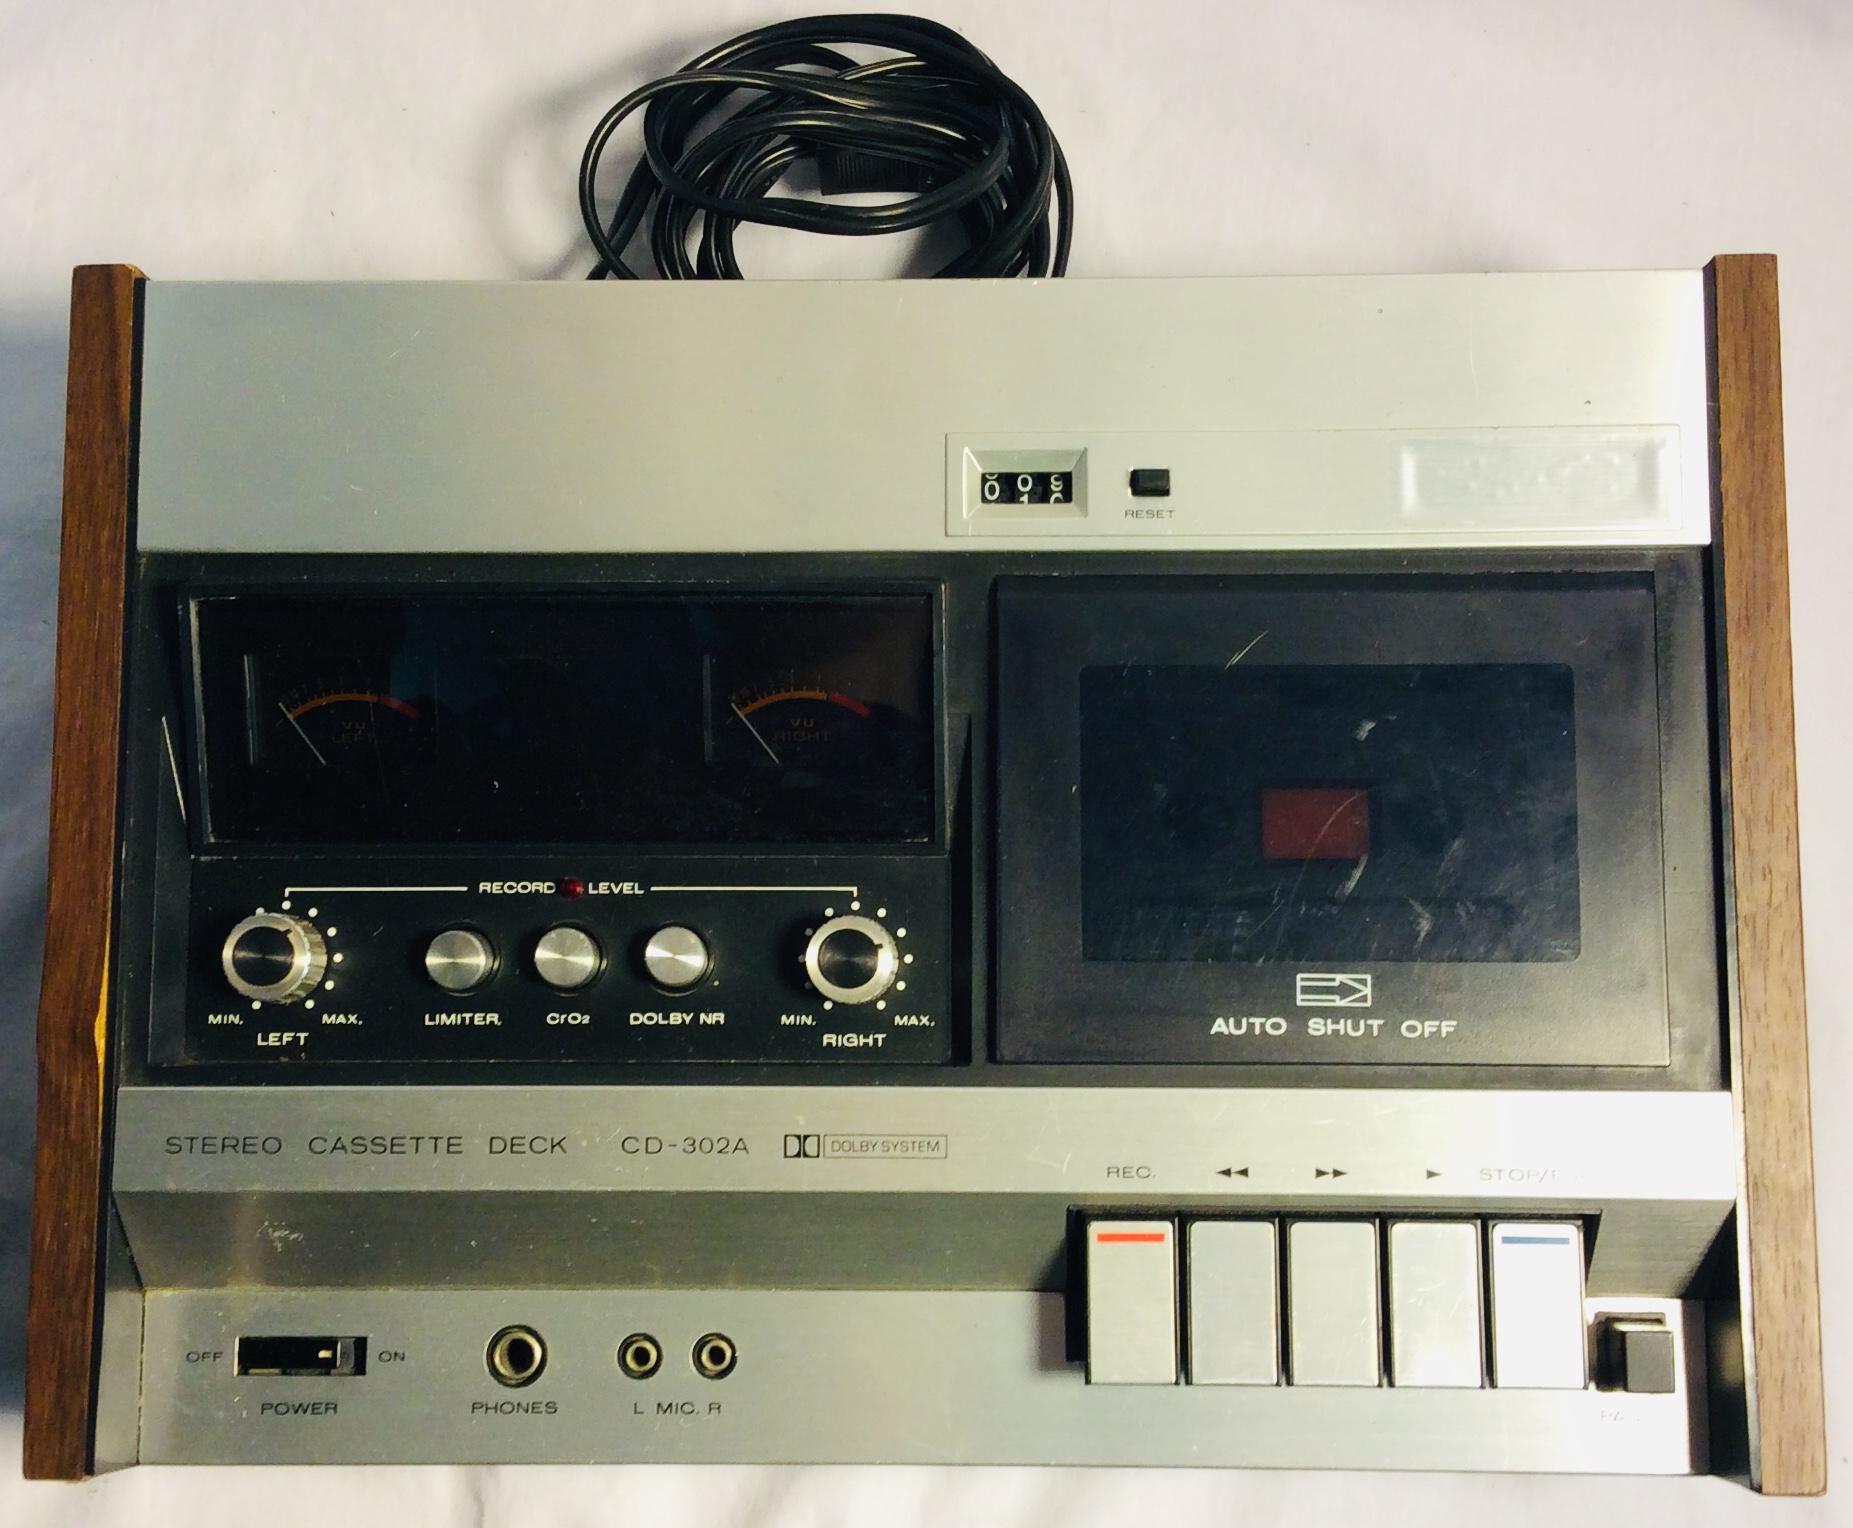 Cassette Deck recorder